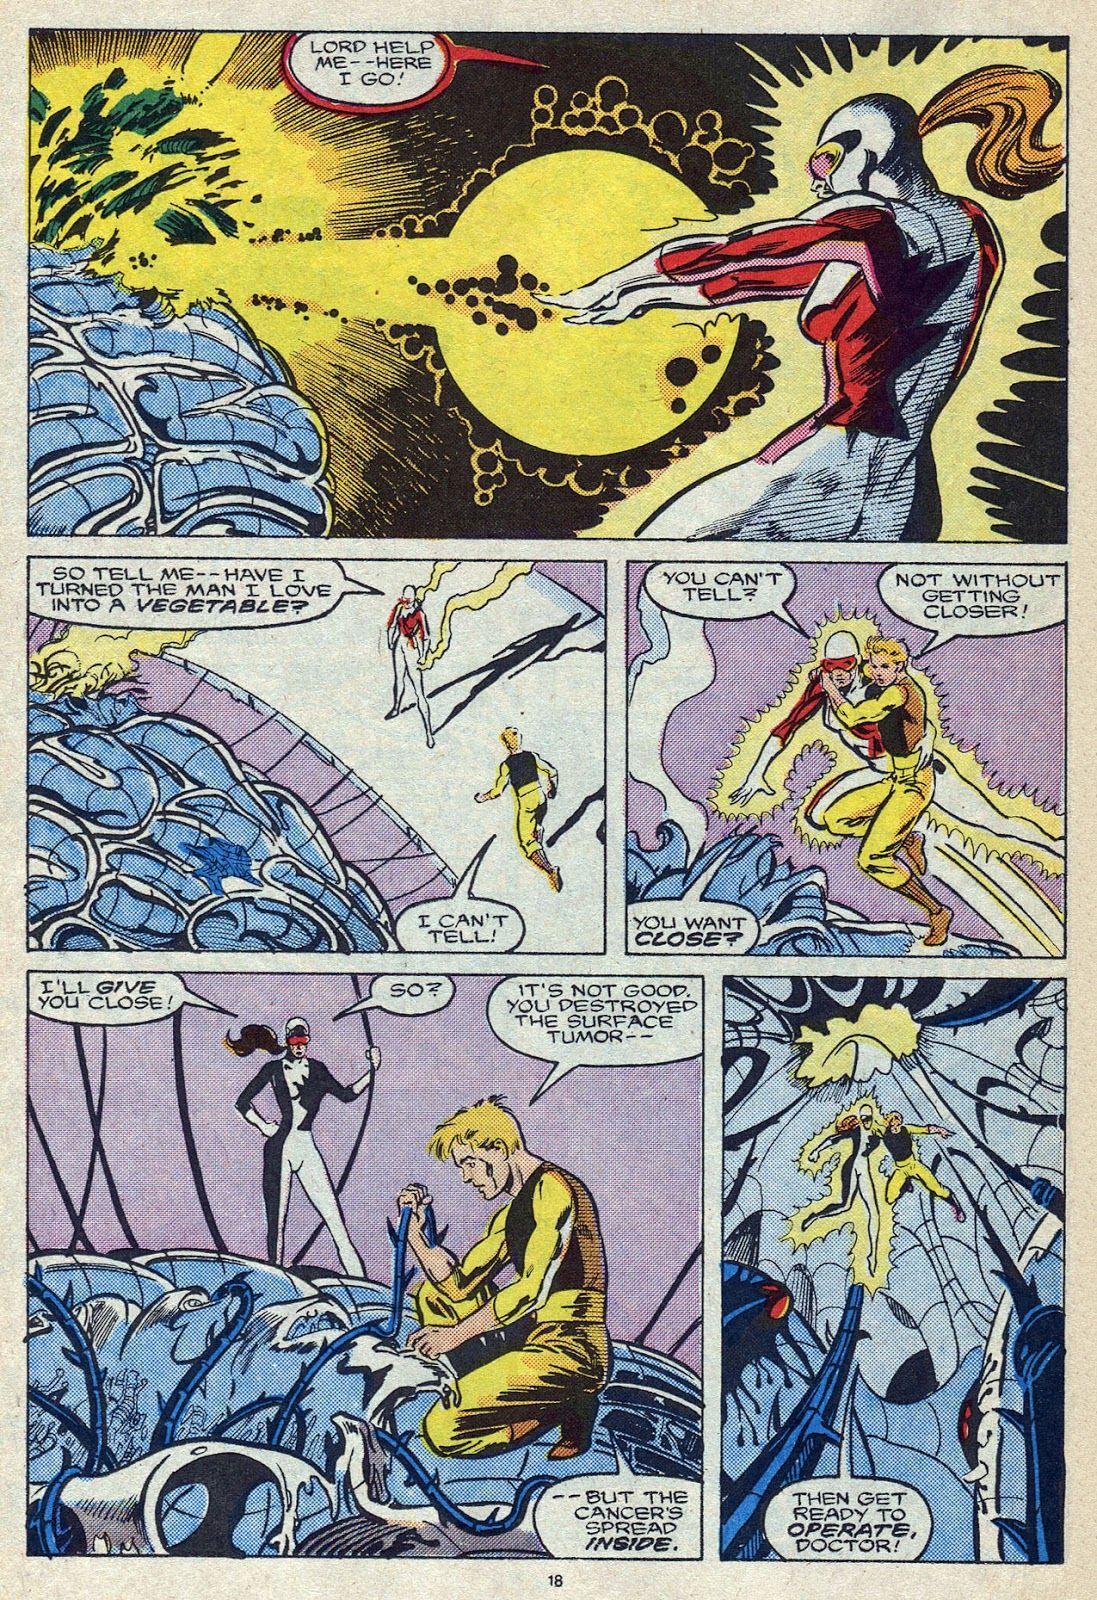 Pin by Lamonta on Marvel Comics | Marvel comics, Comics